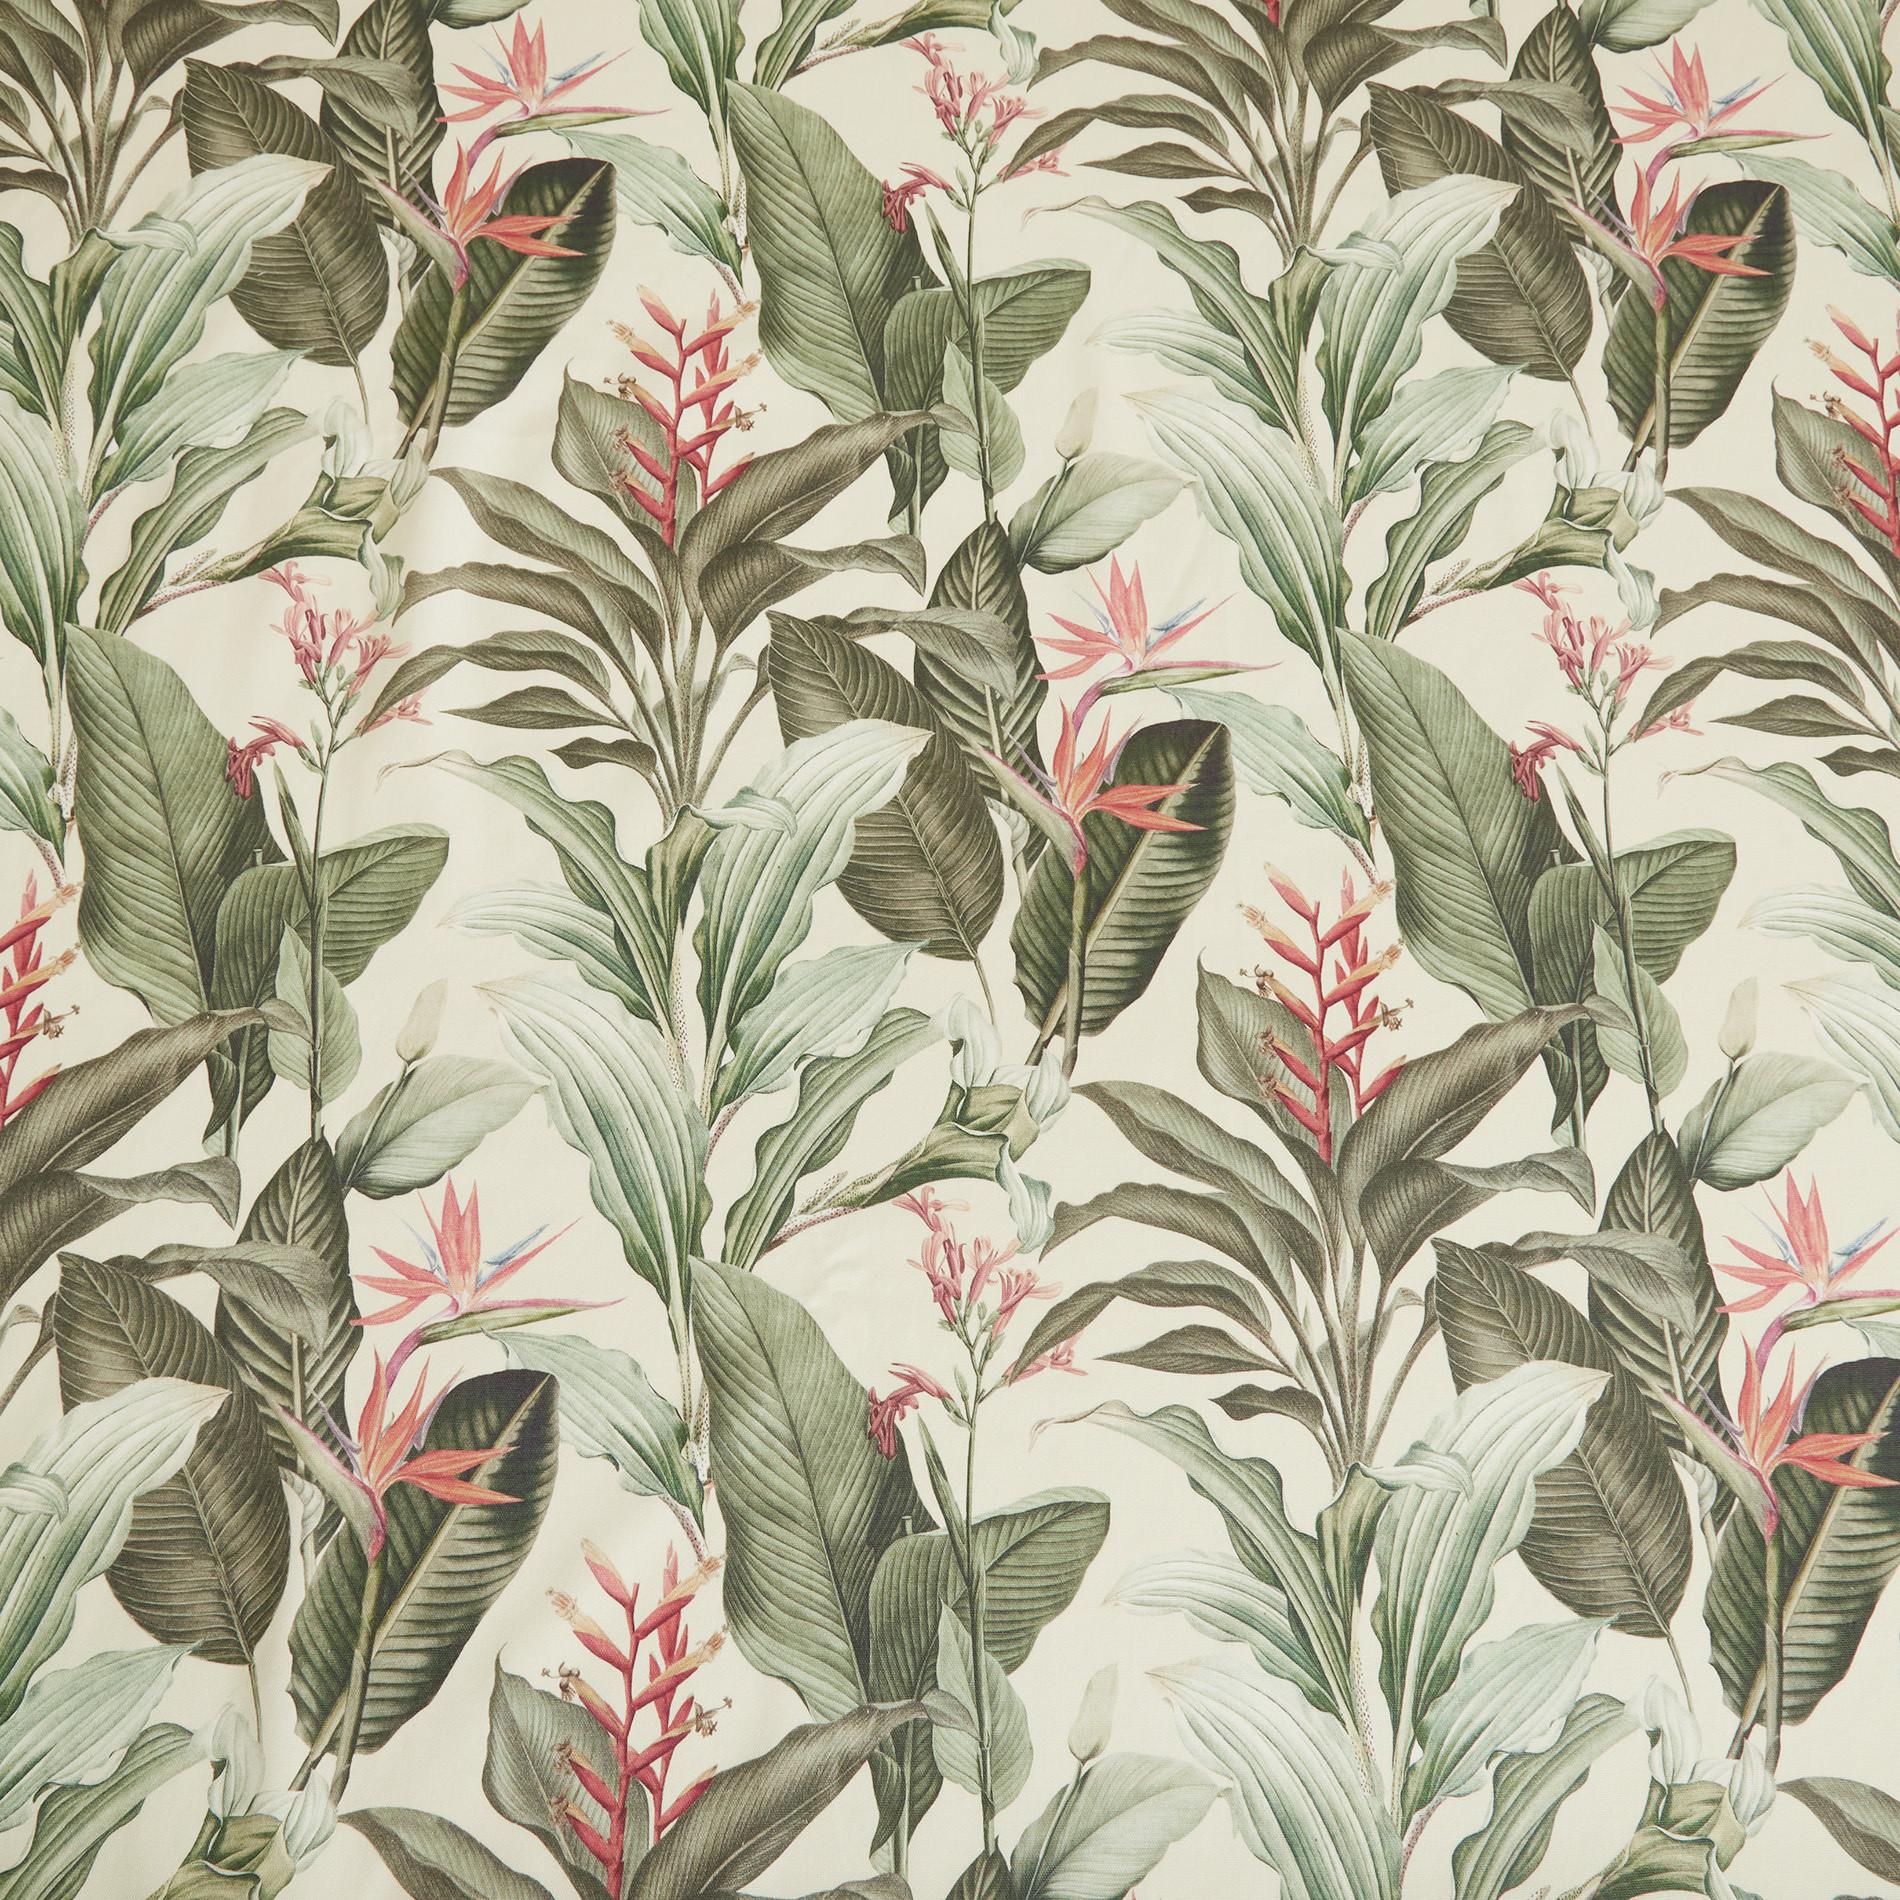 Tovaglia puro cotone stampa giungla, Beige, large image number 1